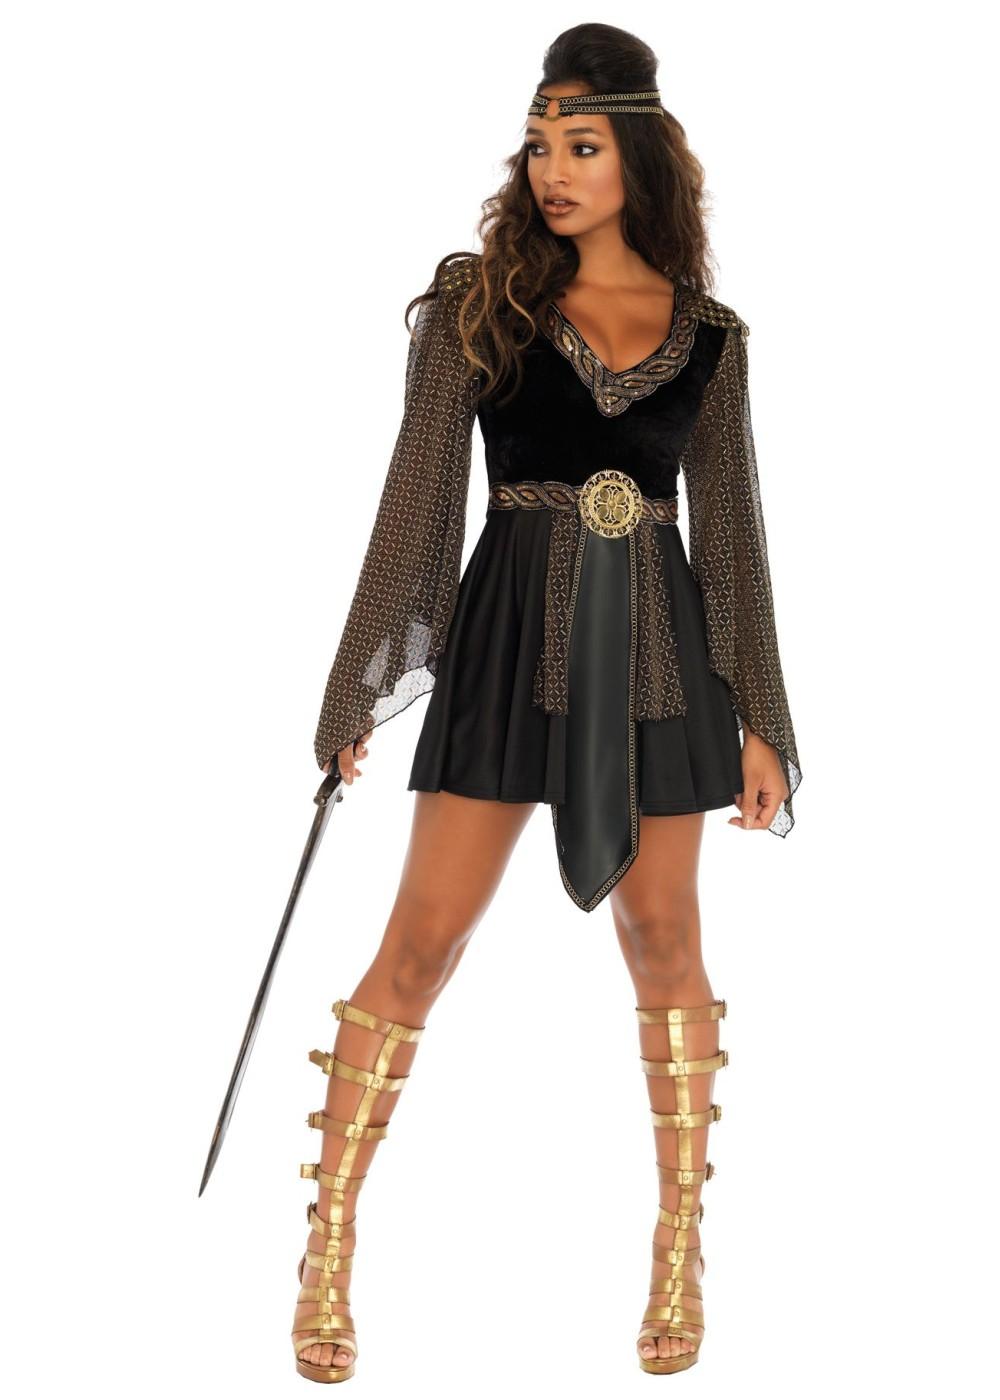 Lawyer Halloween Costumes